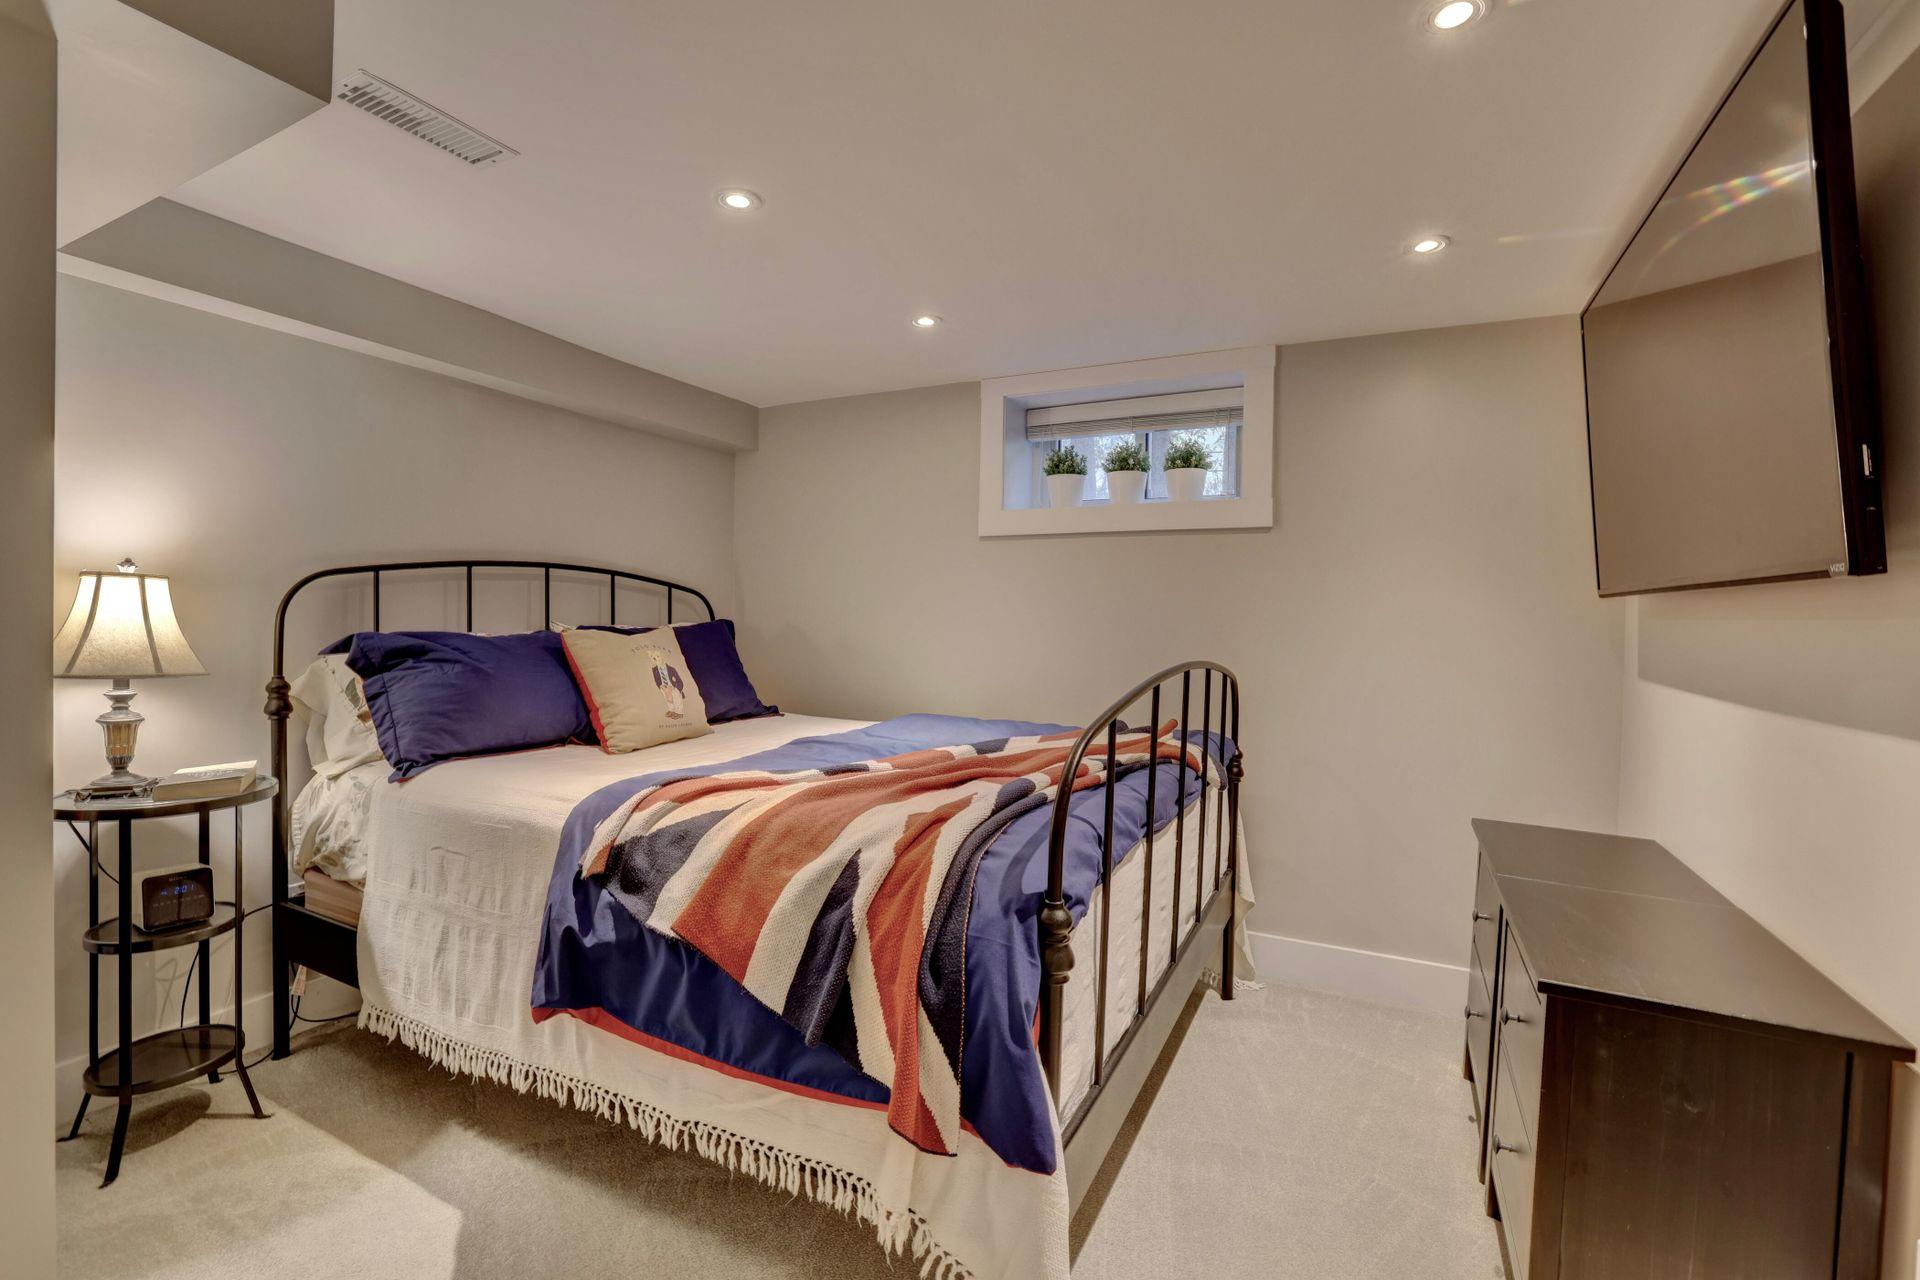 249-lakeview-ave-burlington-bedroom-5 at 249 Lakeview Ave, Burlington,